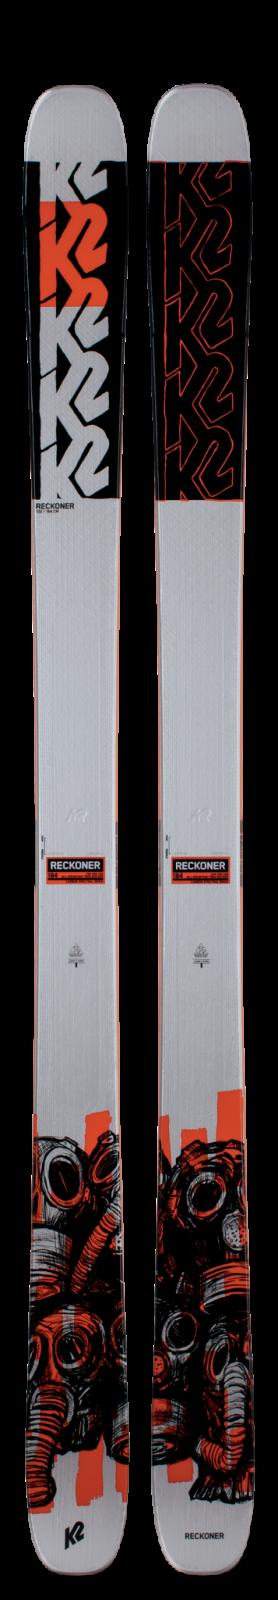 2021 K2 Reckoner 102 Men's Skis